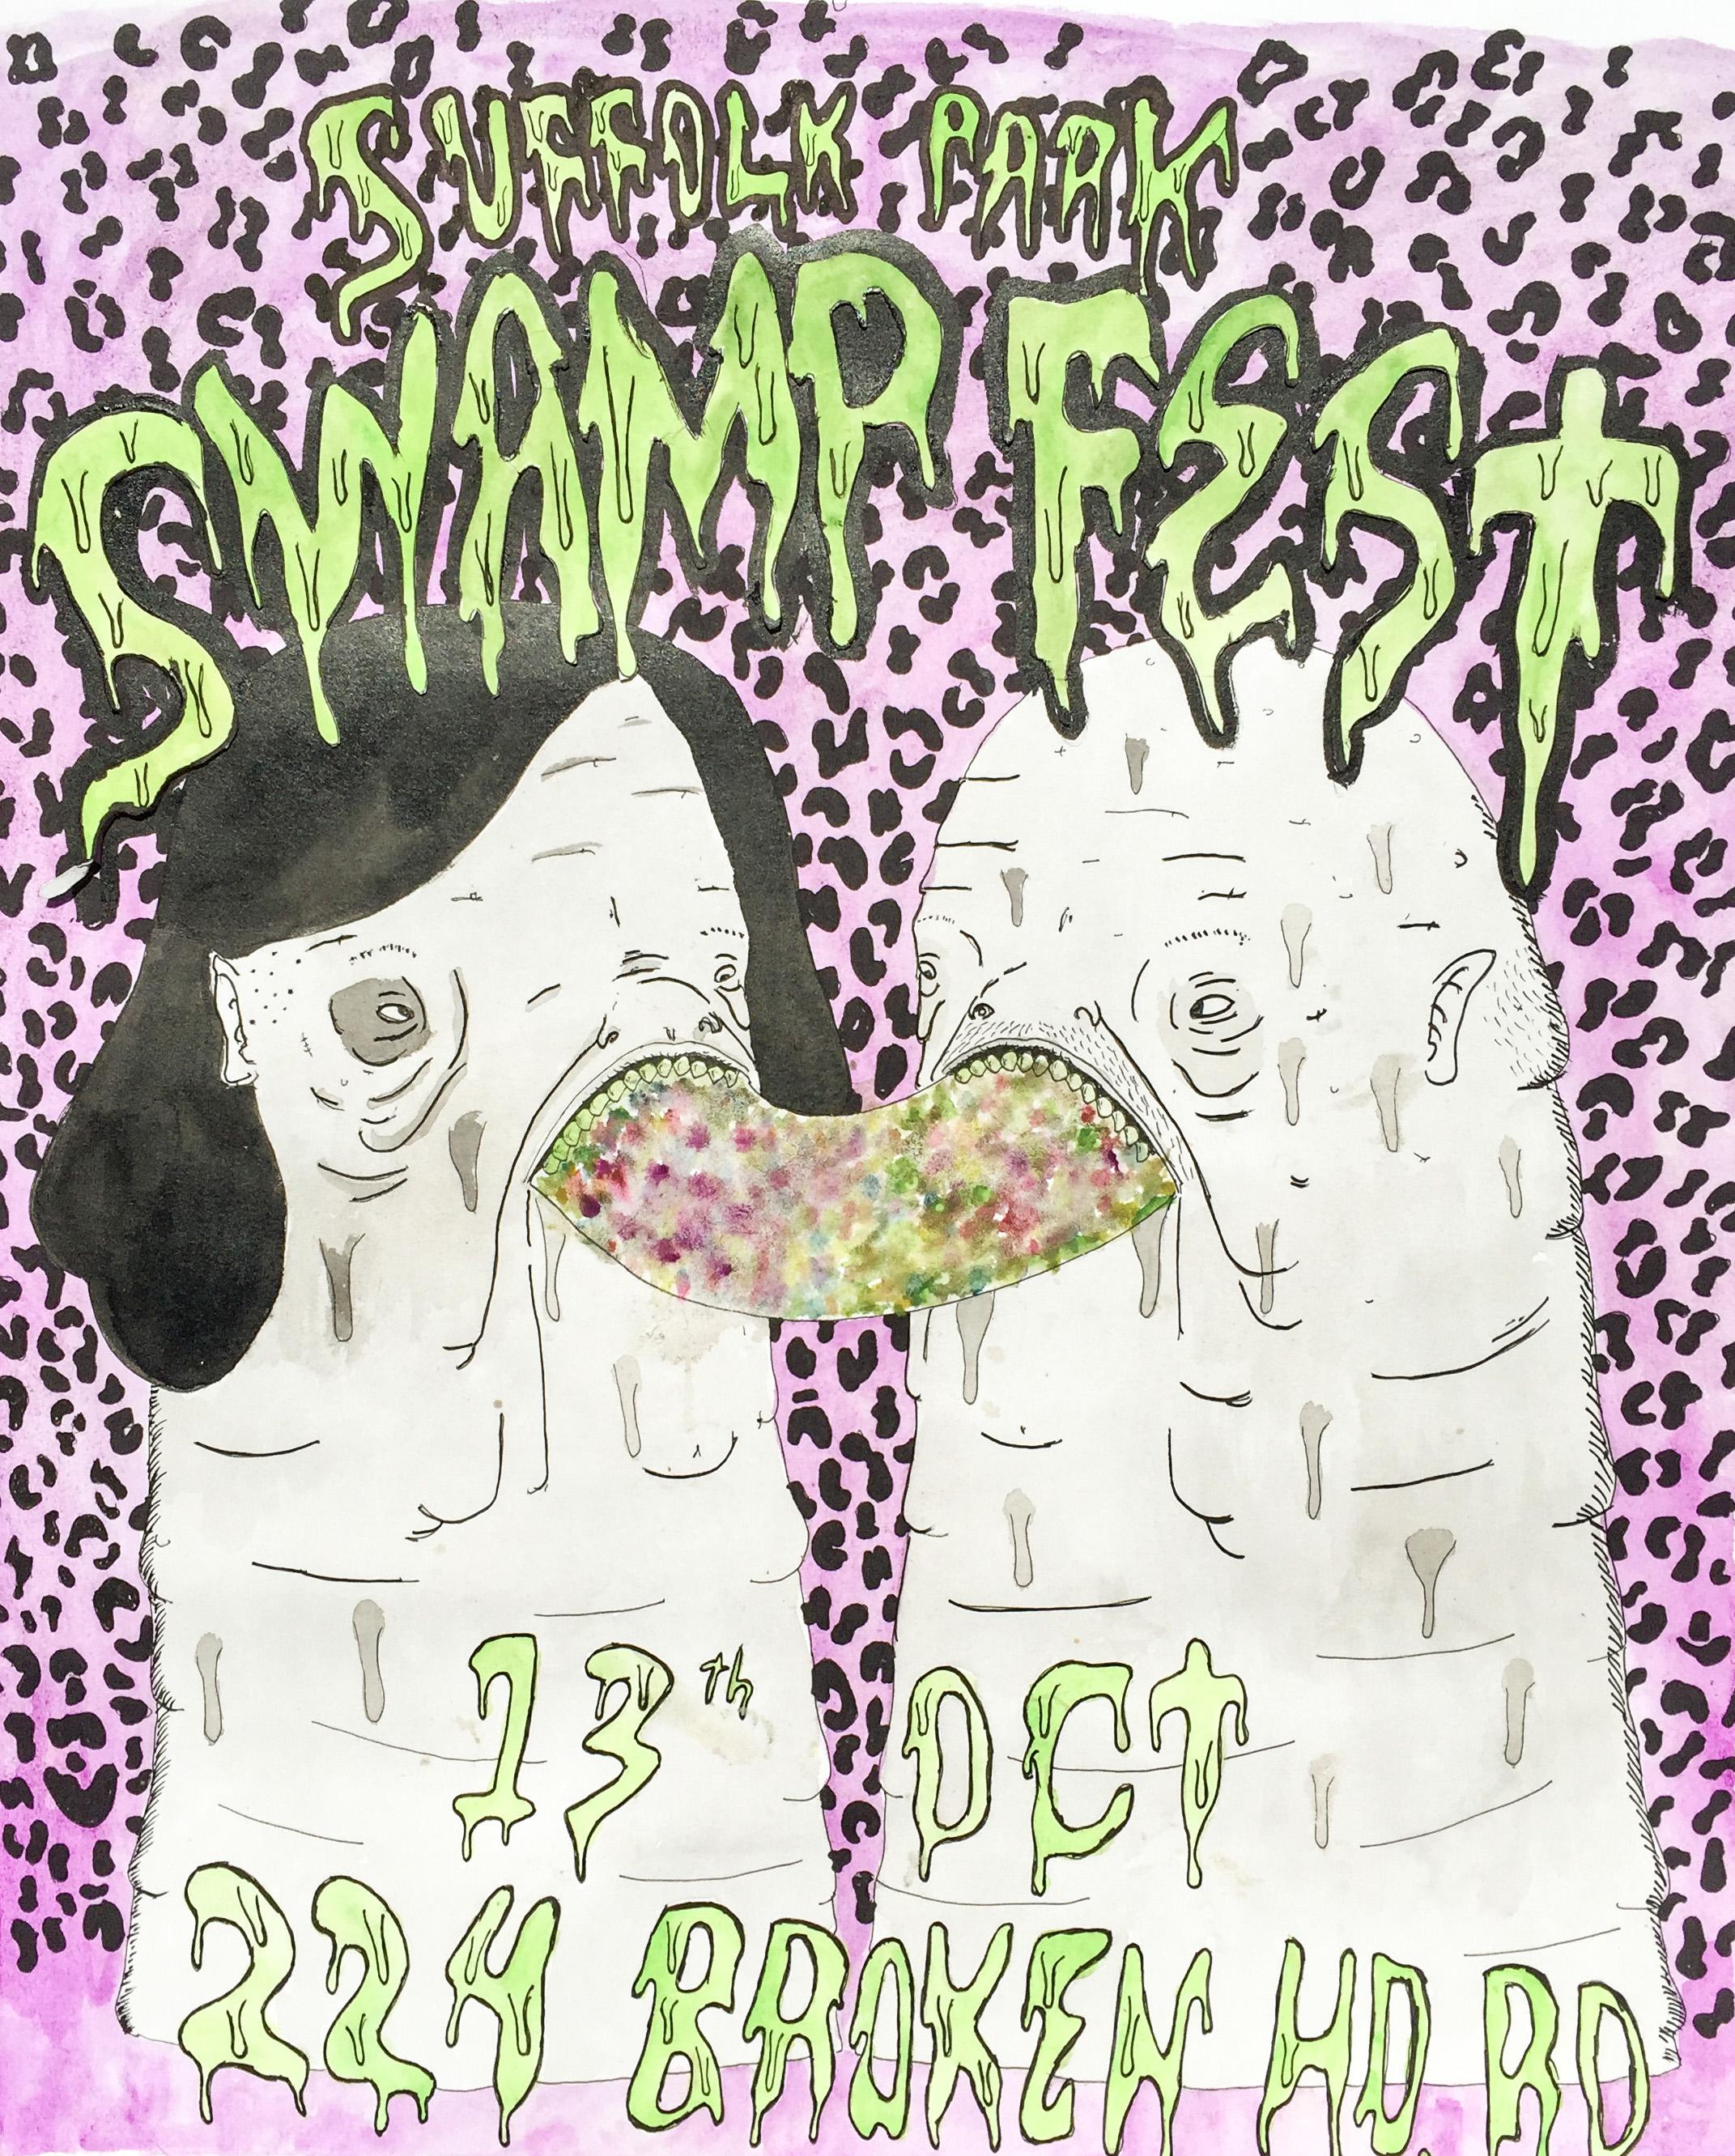 Swampfest poster 2012